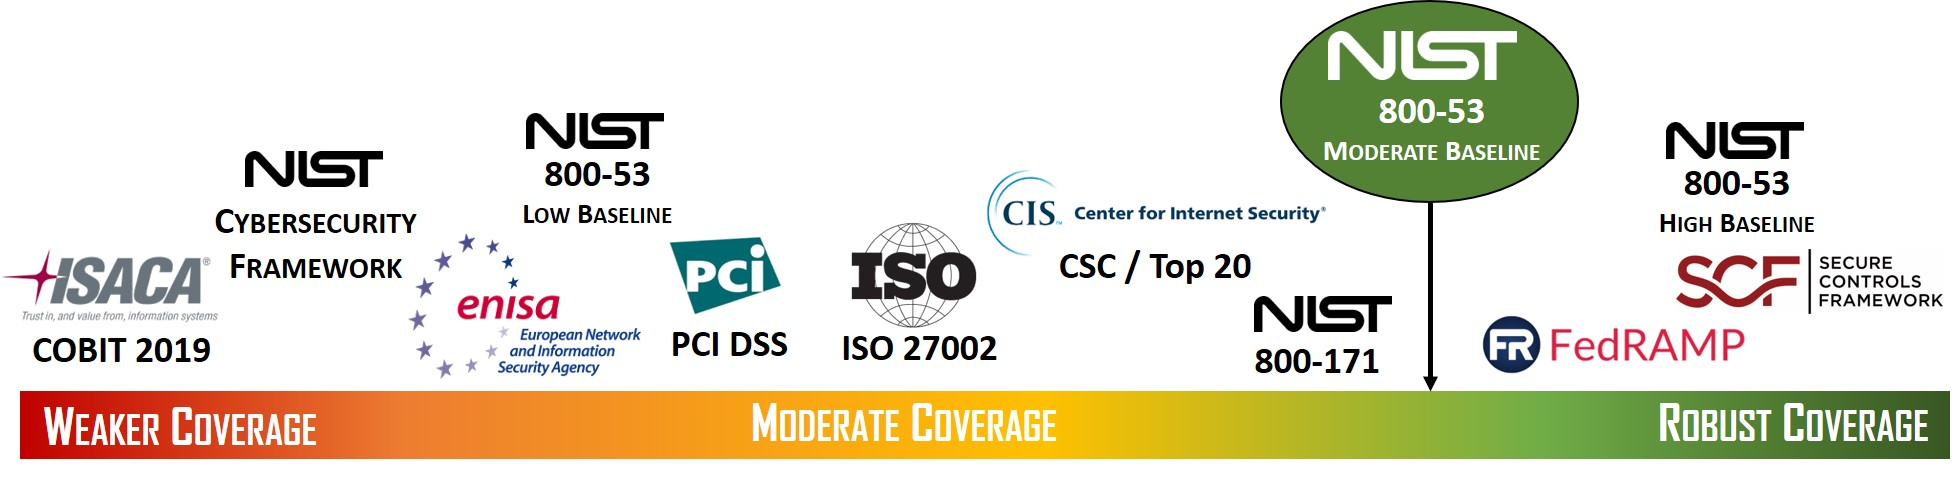 2021-nist-sp-800-53-r5-moderate-policies-standards-procedures.jpg